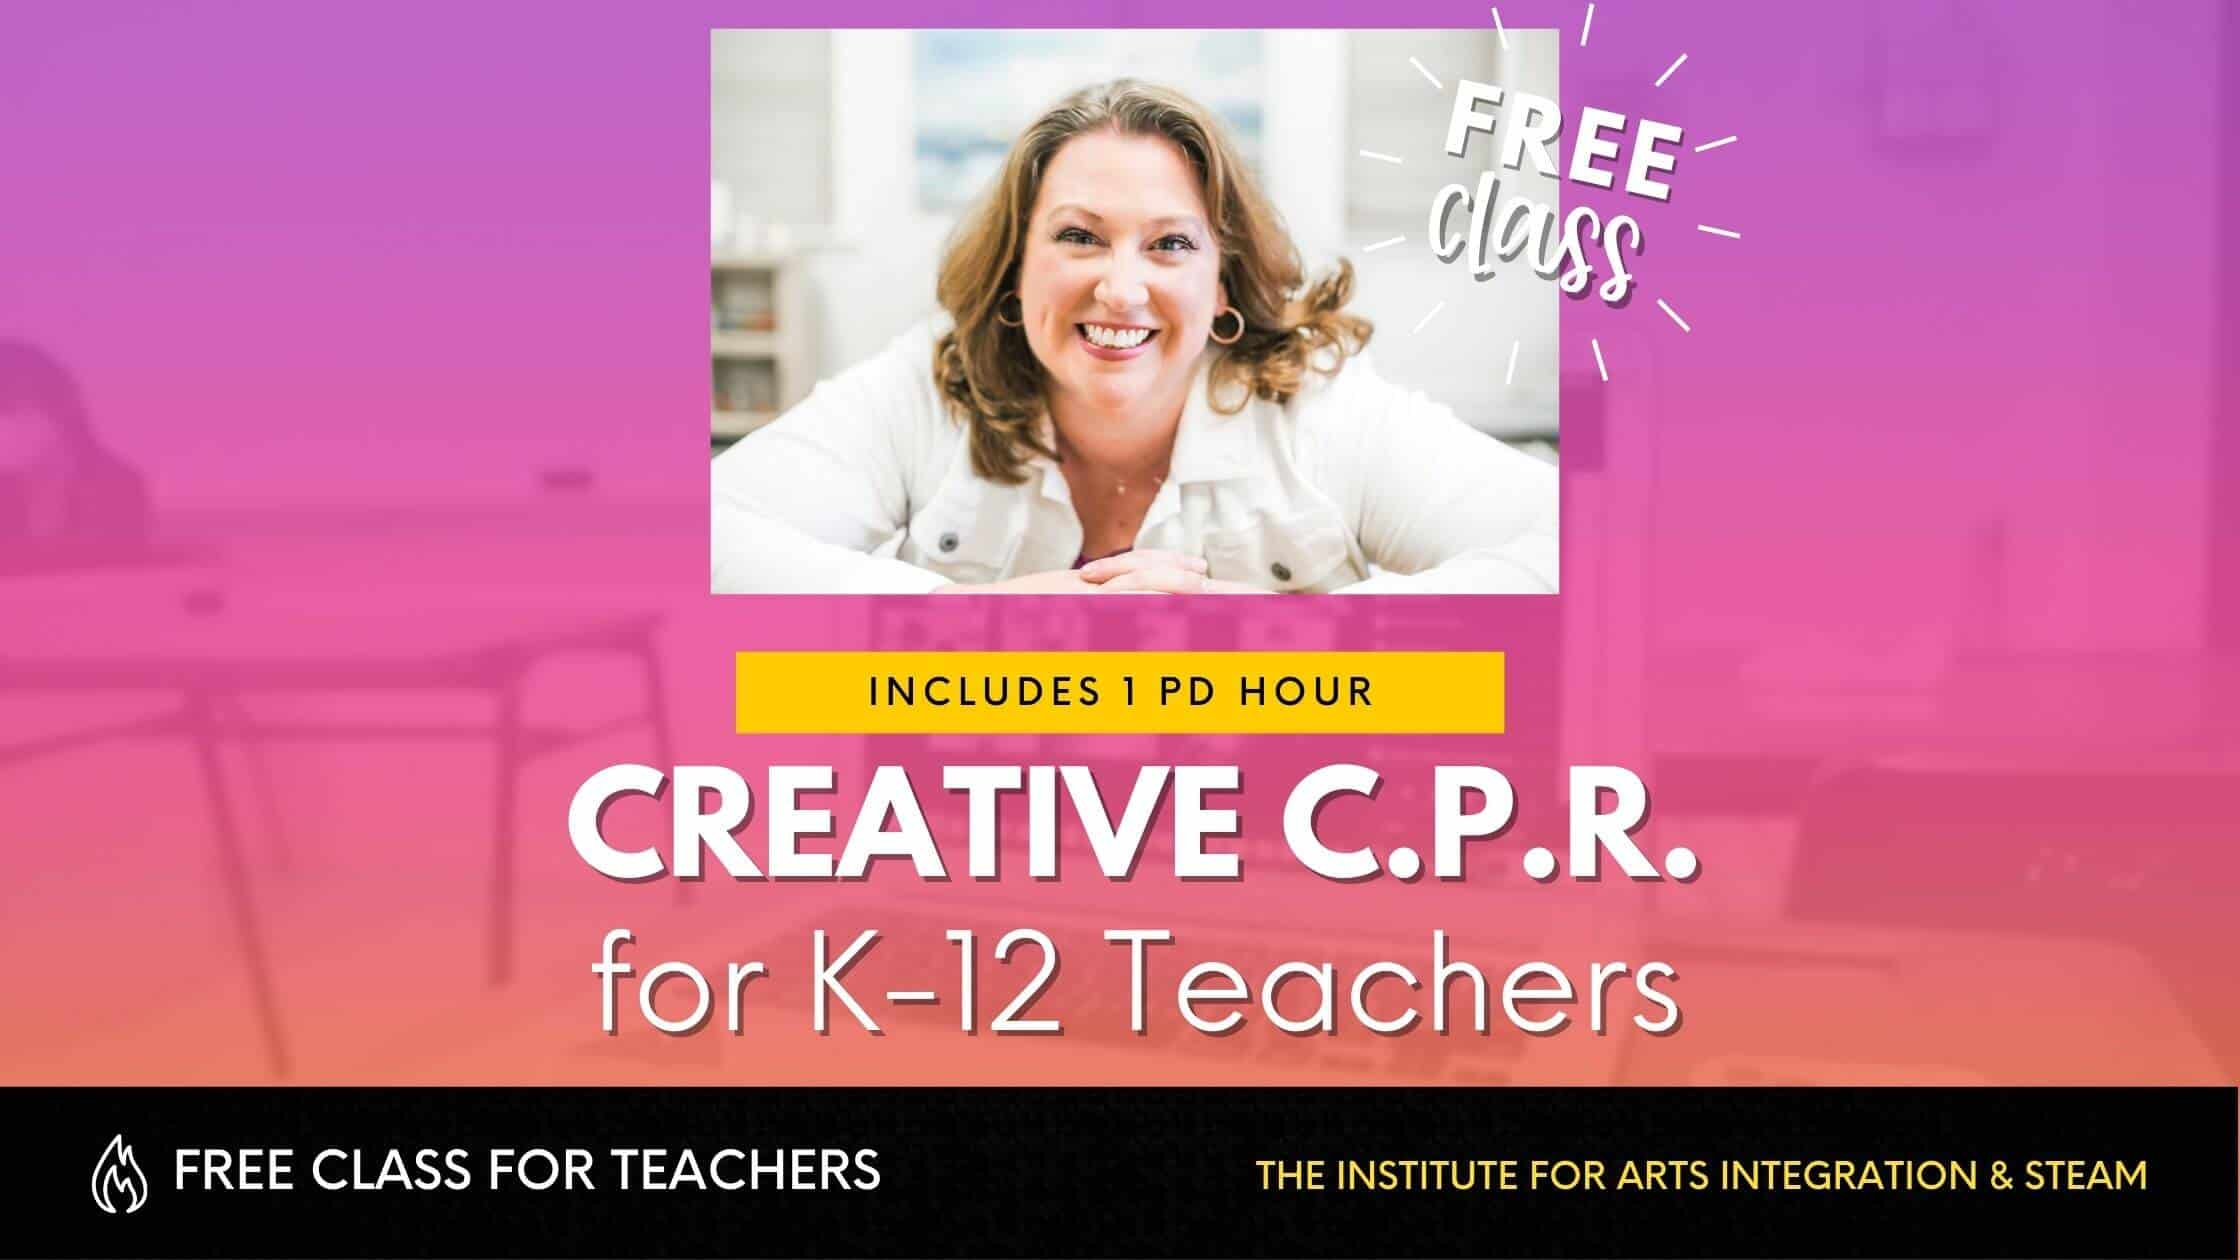 Creative CPR for Teachers Class